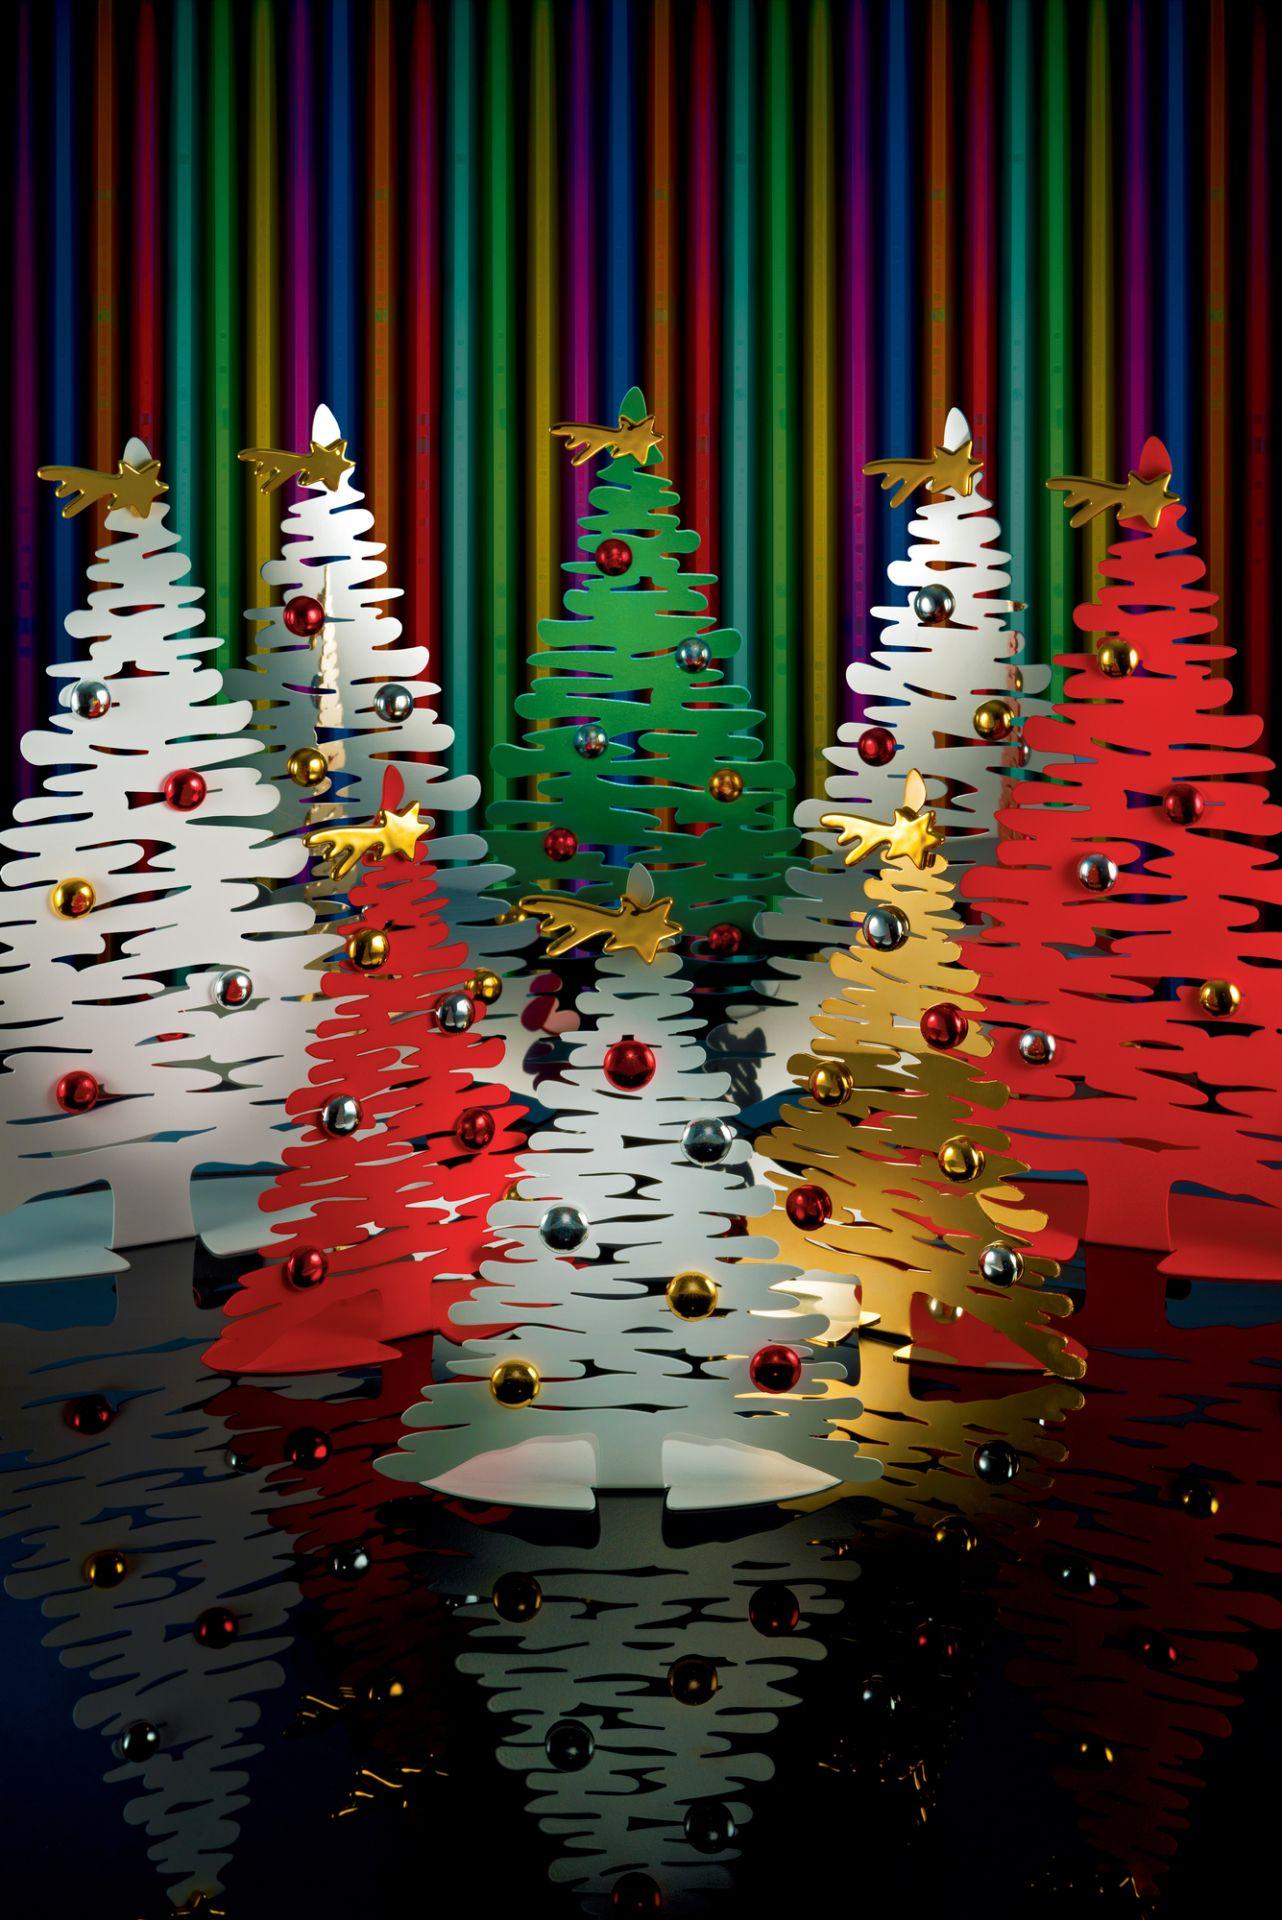 Bark for Christmas Weihnachtsschmuck BM06 GR Alessi